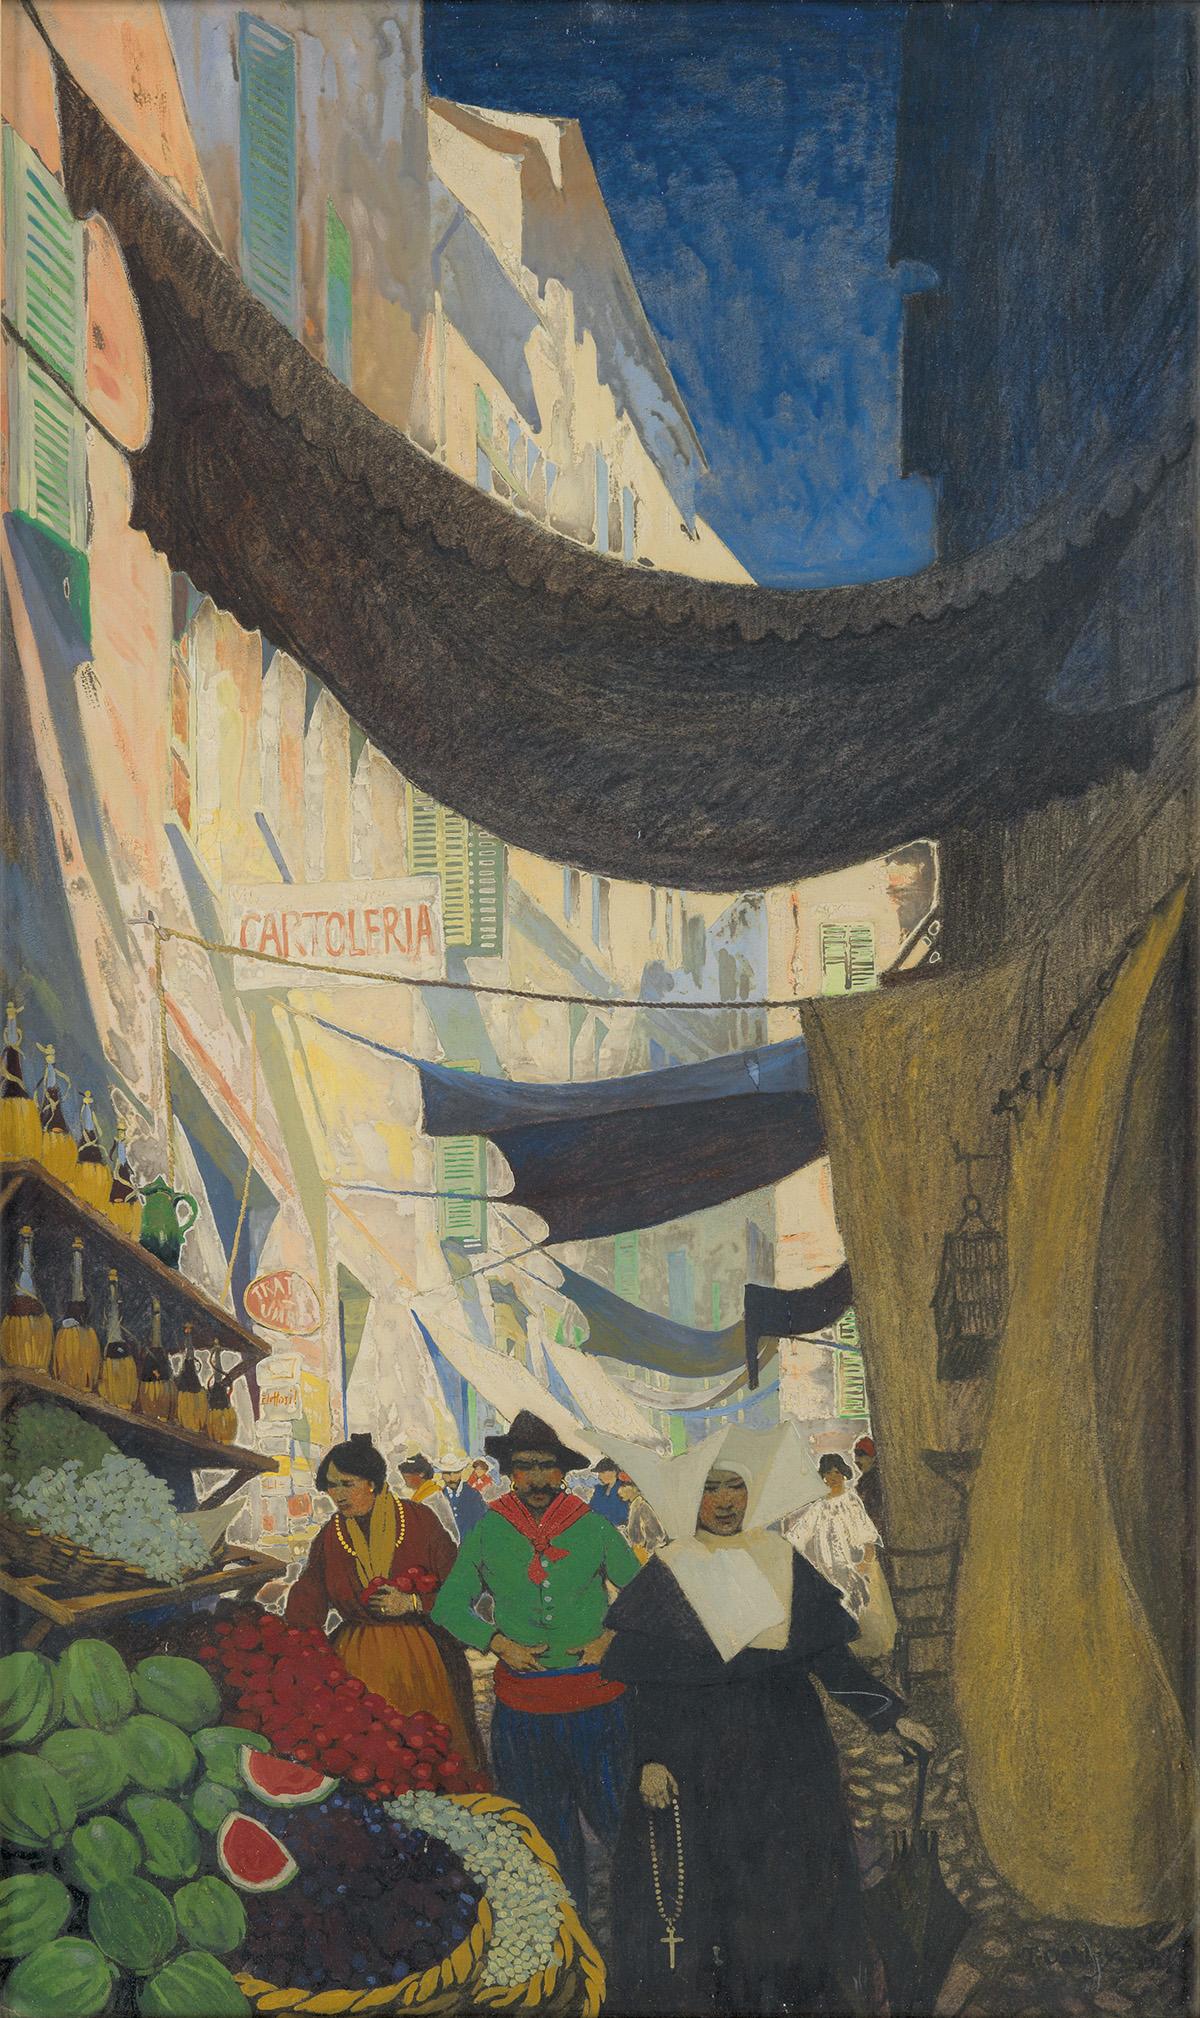 THORNTON OAKLEY. Via Vittorio Emanuele Alassio.